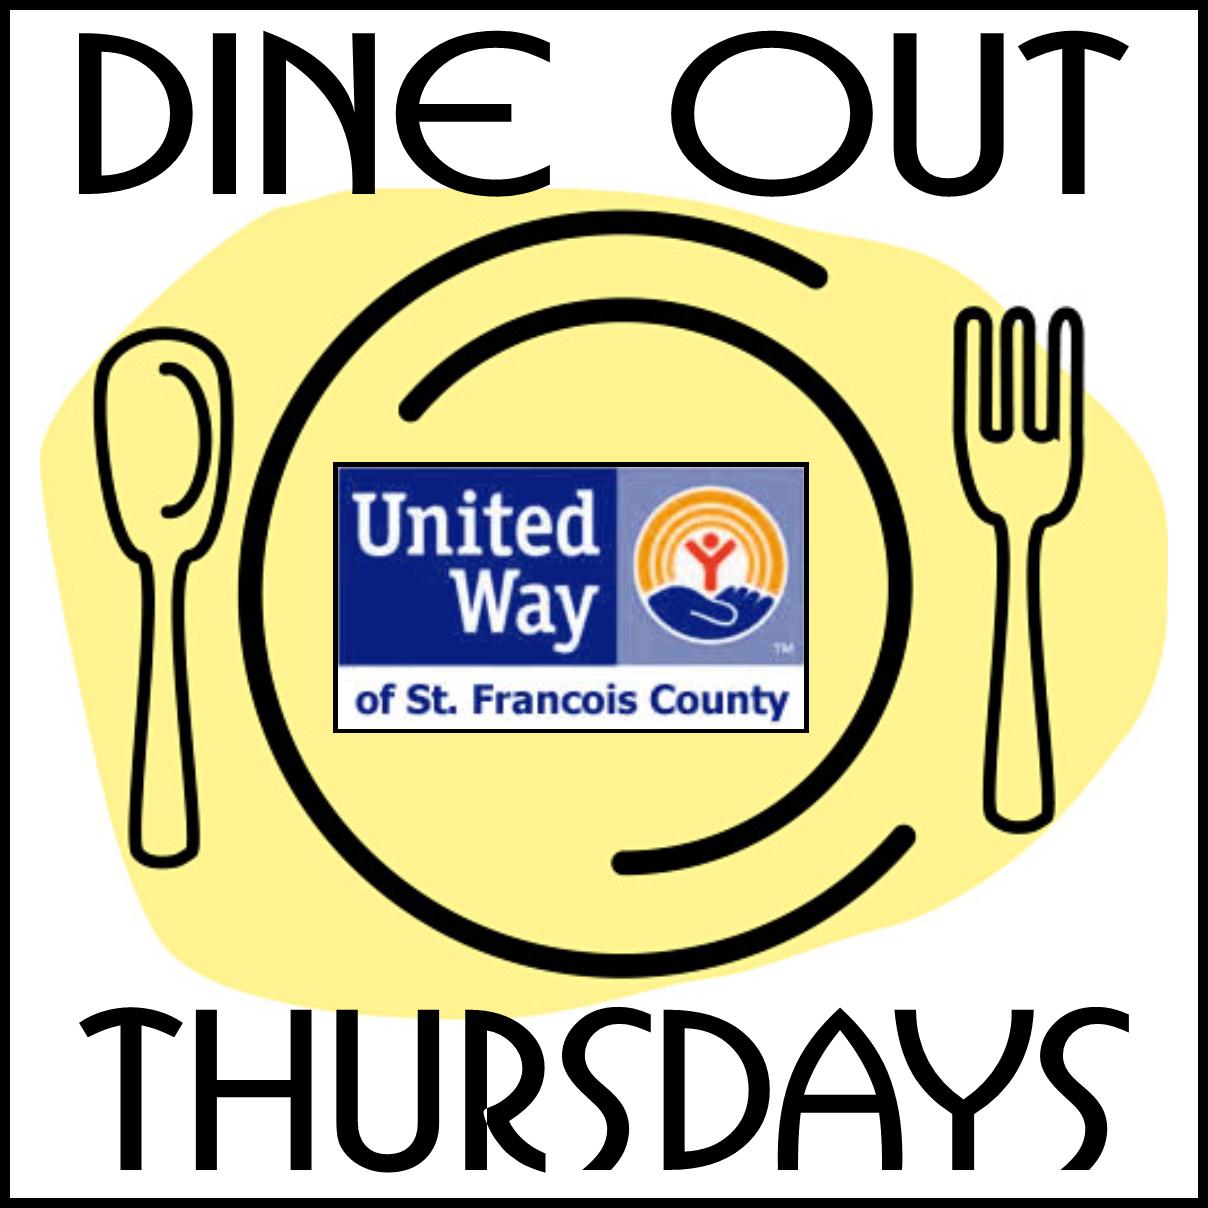 Dine Out Thursday for United Way at Cici's Pizza or Huddle House (Bonne Terre & Leadington)